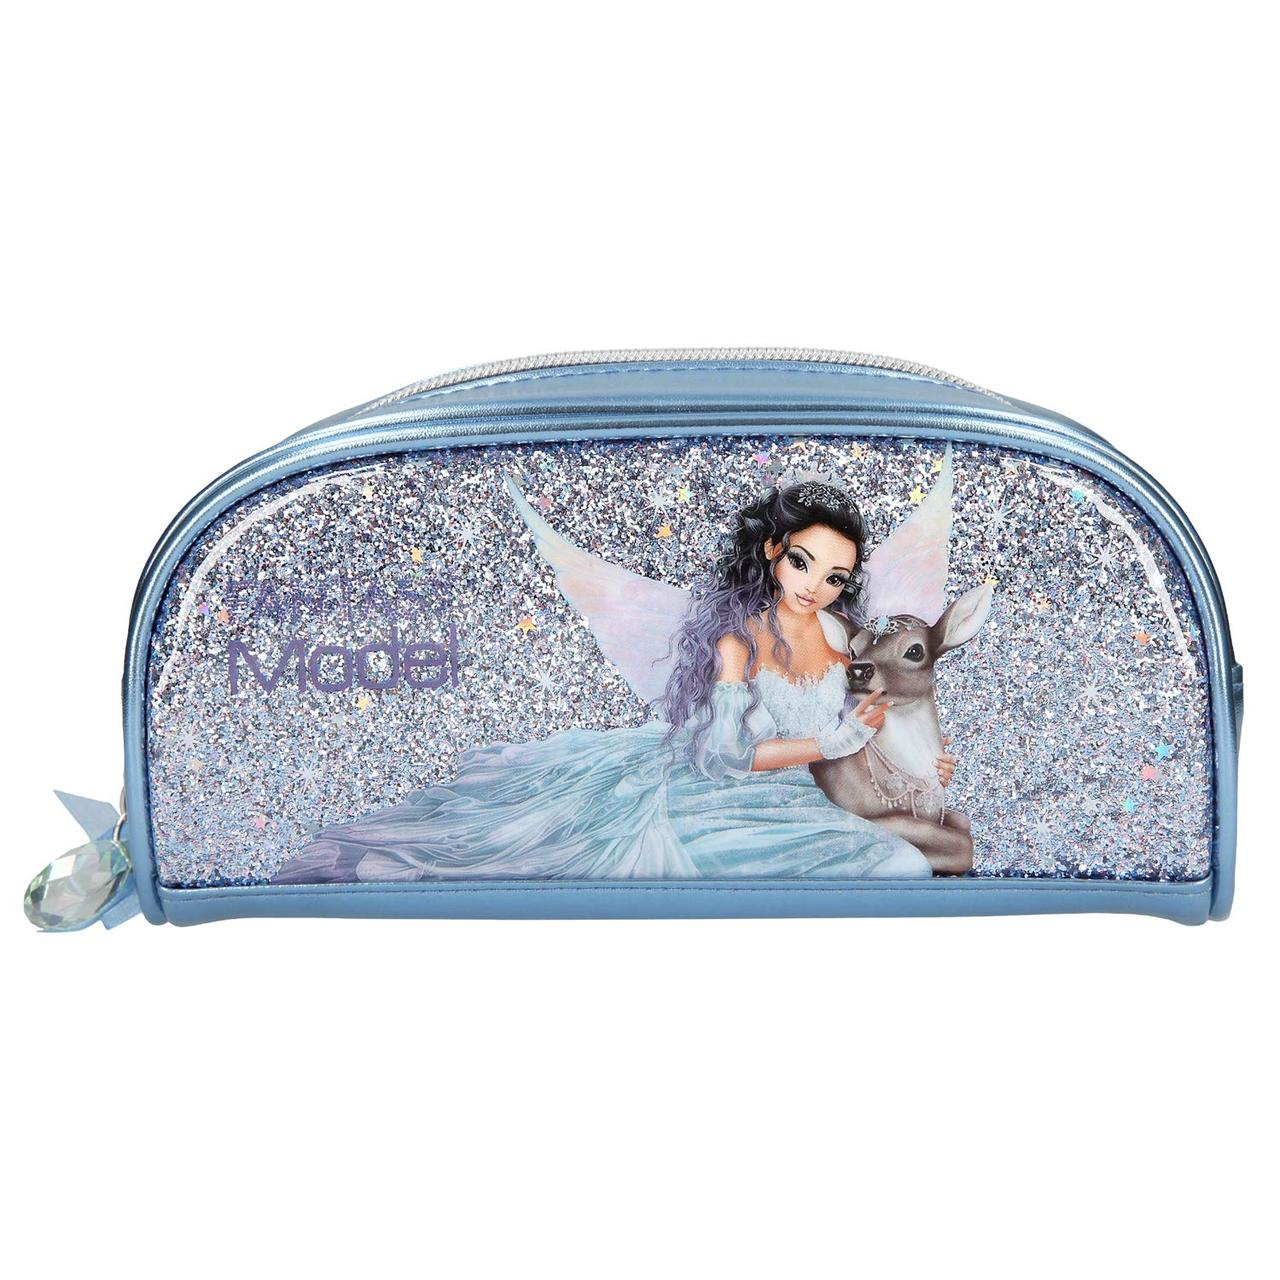 Пенал-косметичка Top Model IcePrincess ( Top-Model пенал косметичка Fantasy model Ледяная принцесса Топ Модел)